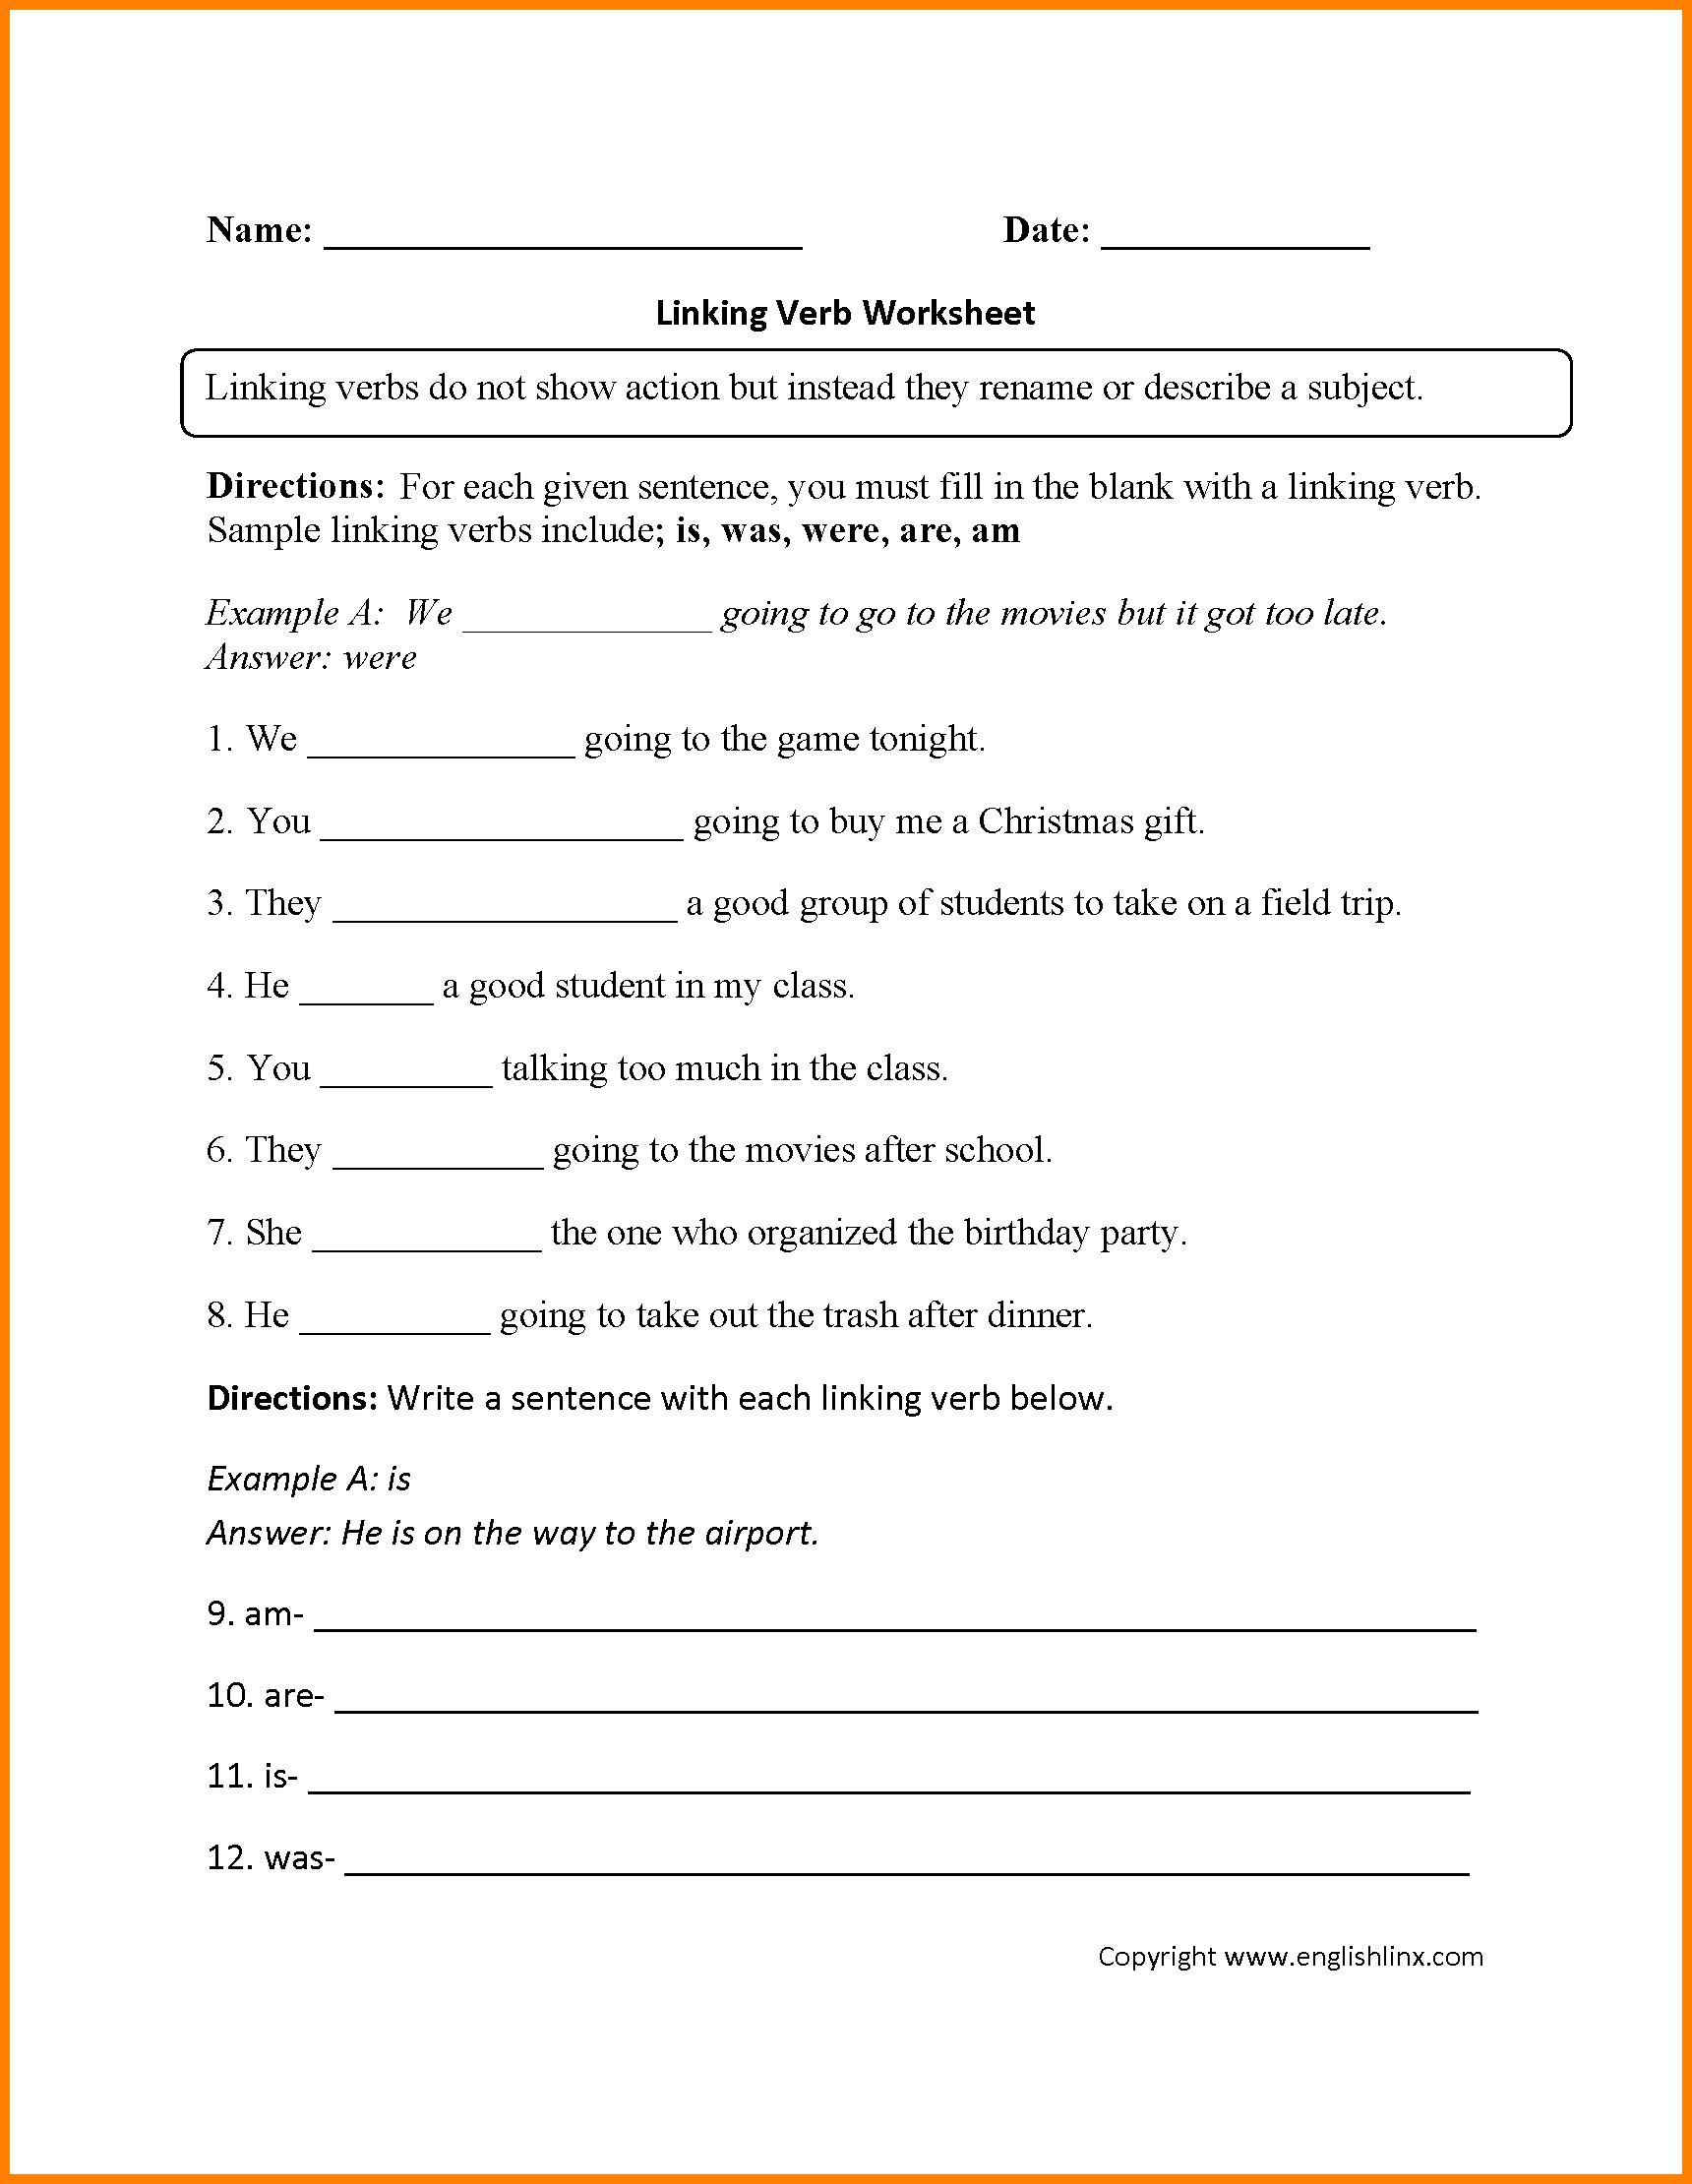 Free Printable Linking Verbs Worksheets